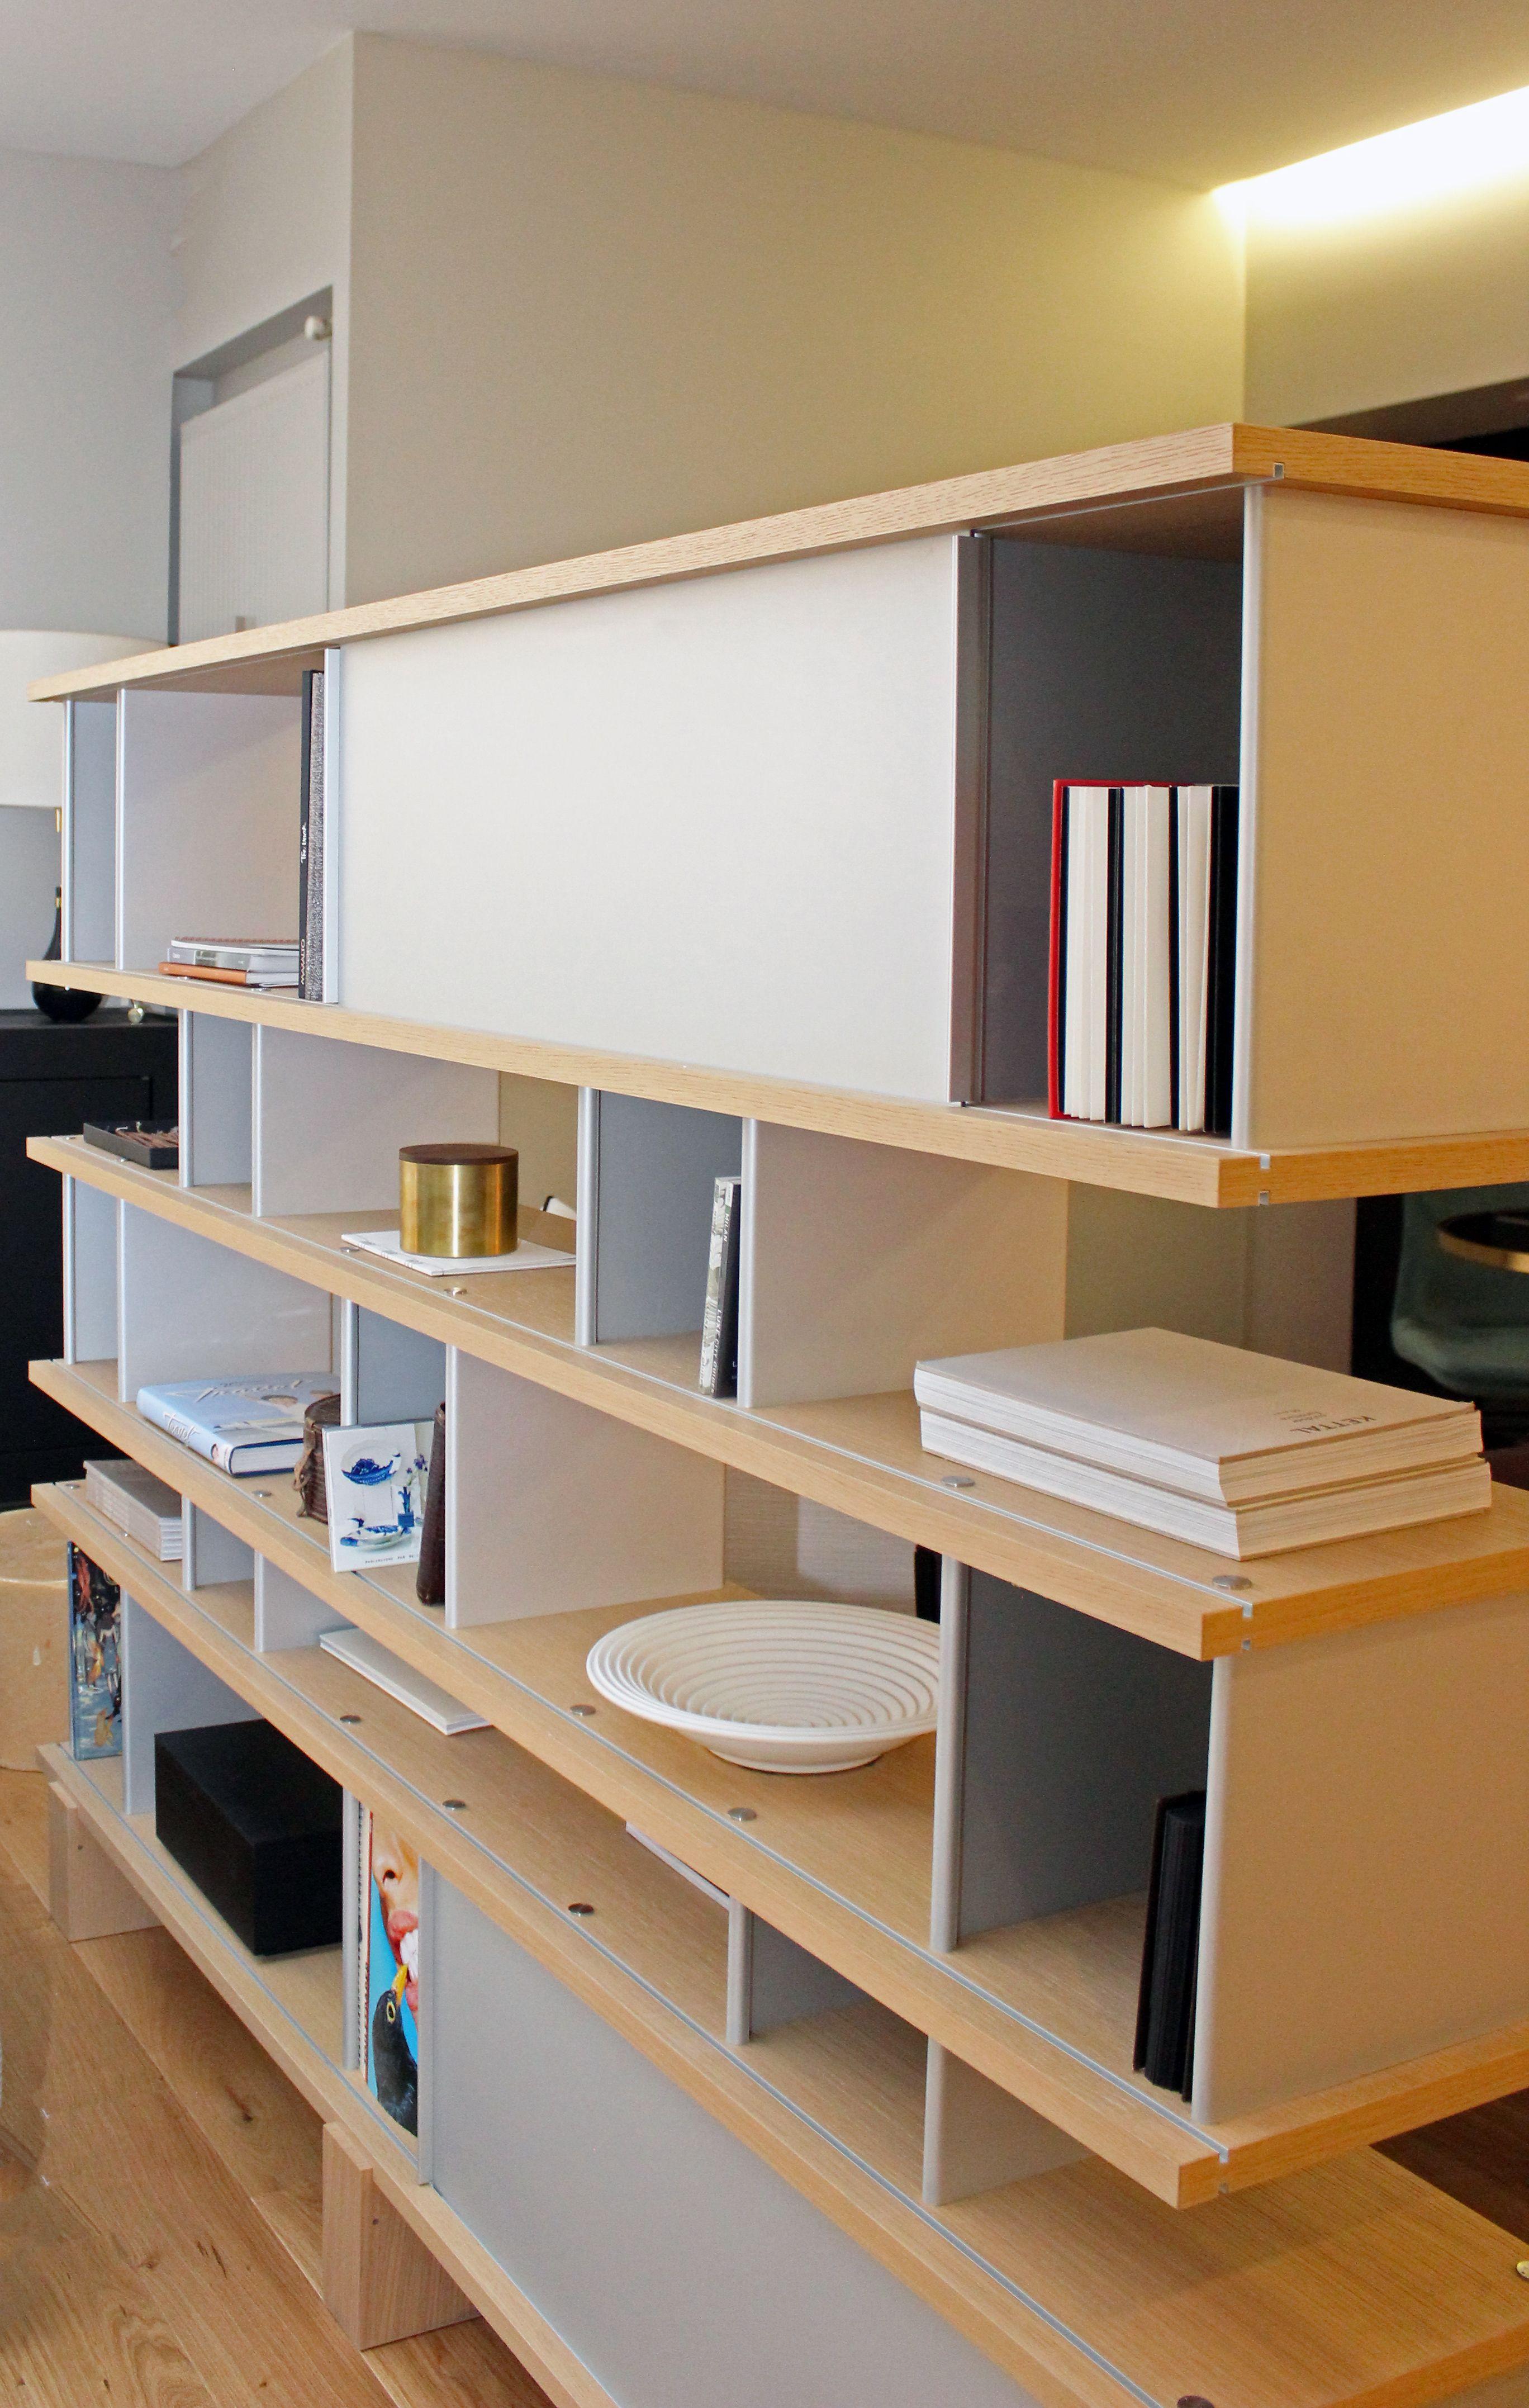 rangement biblioth que salon livre d coration. Black Bedroom Furniture Sets. Home Design Ideas